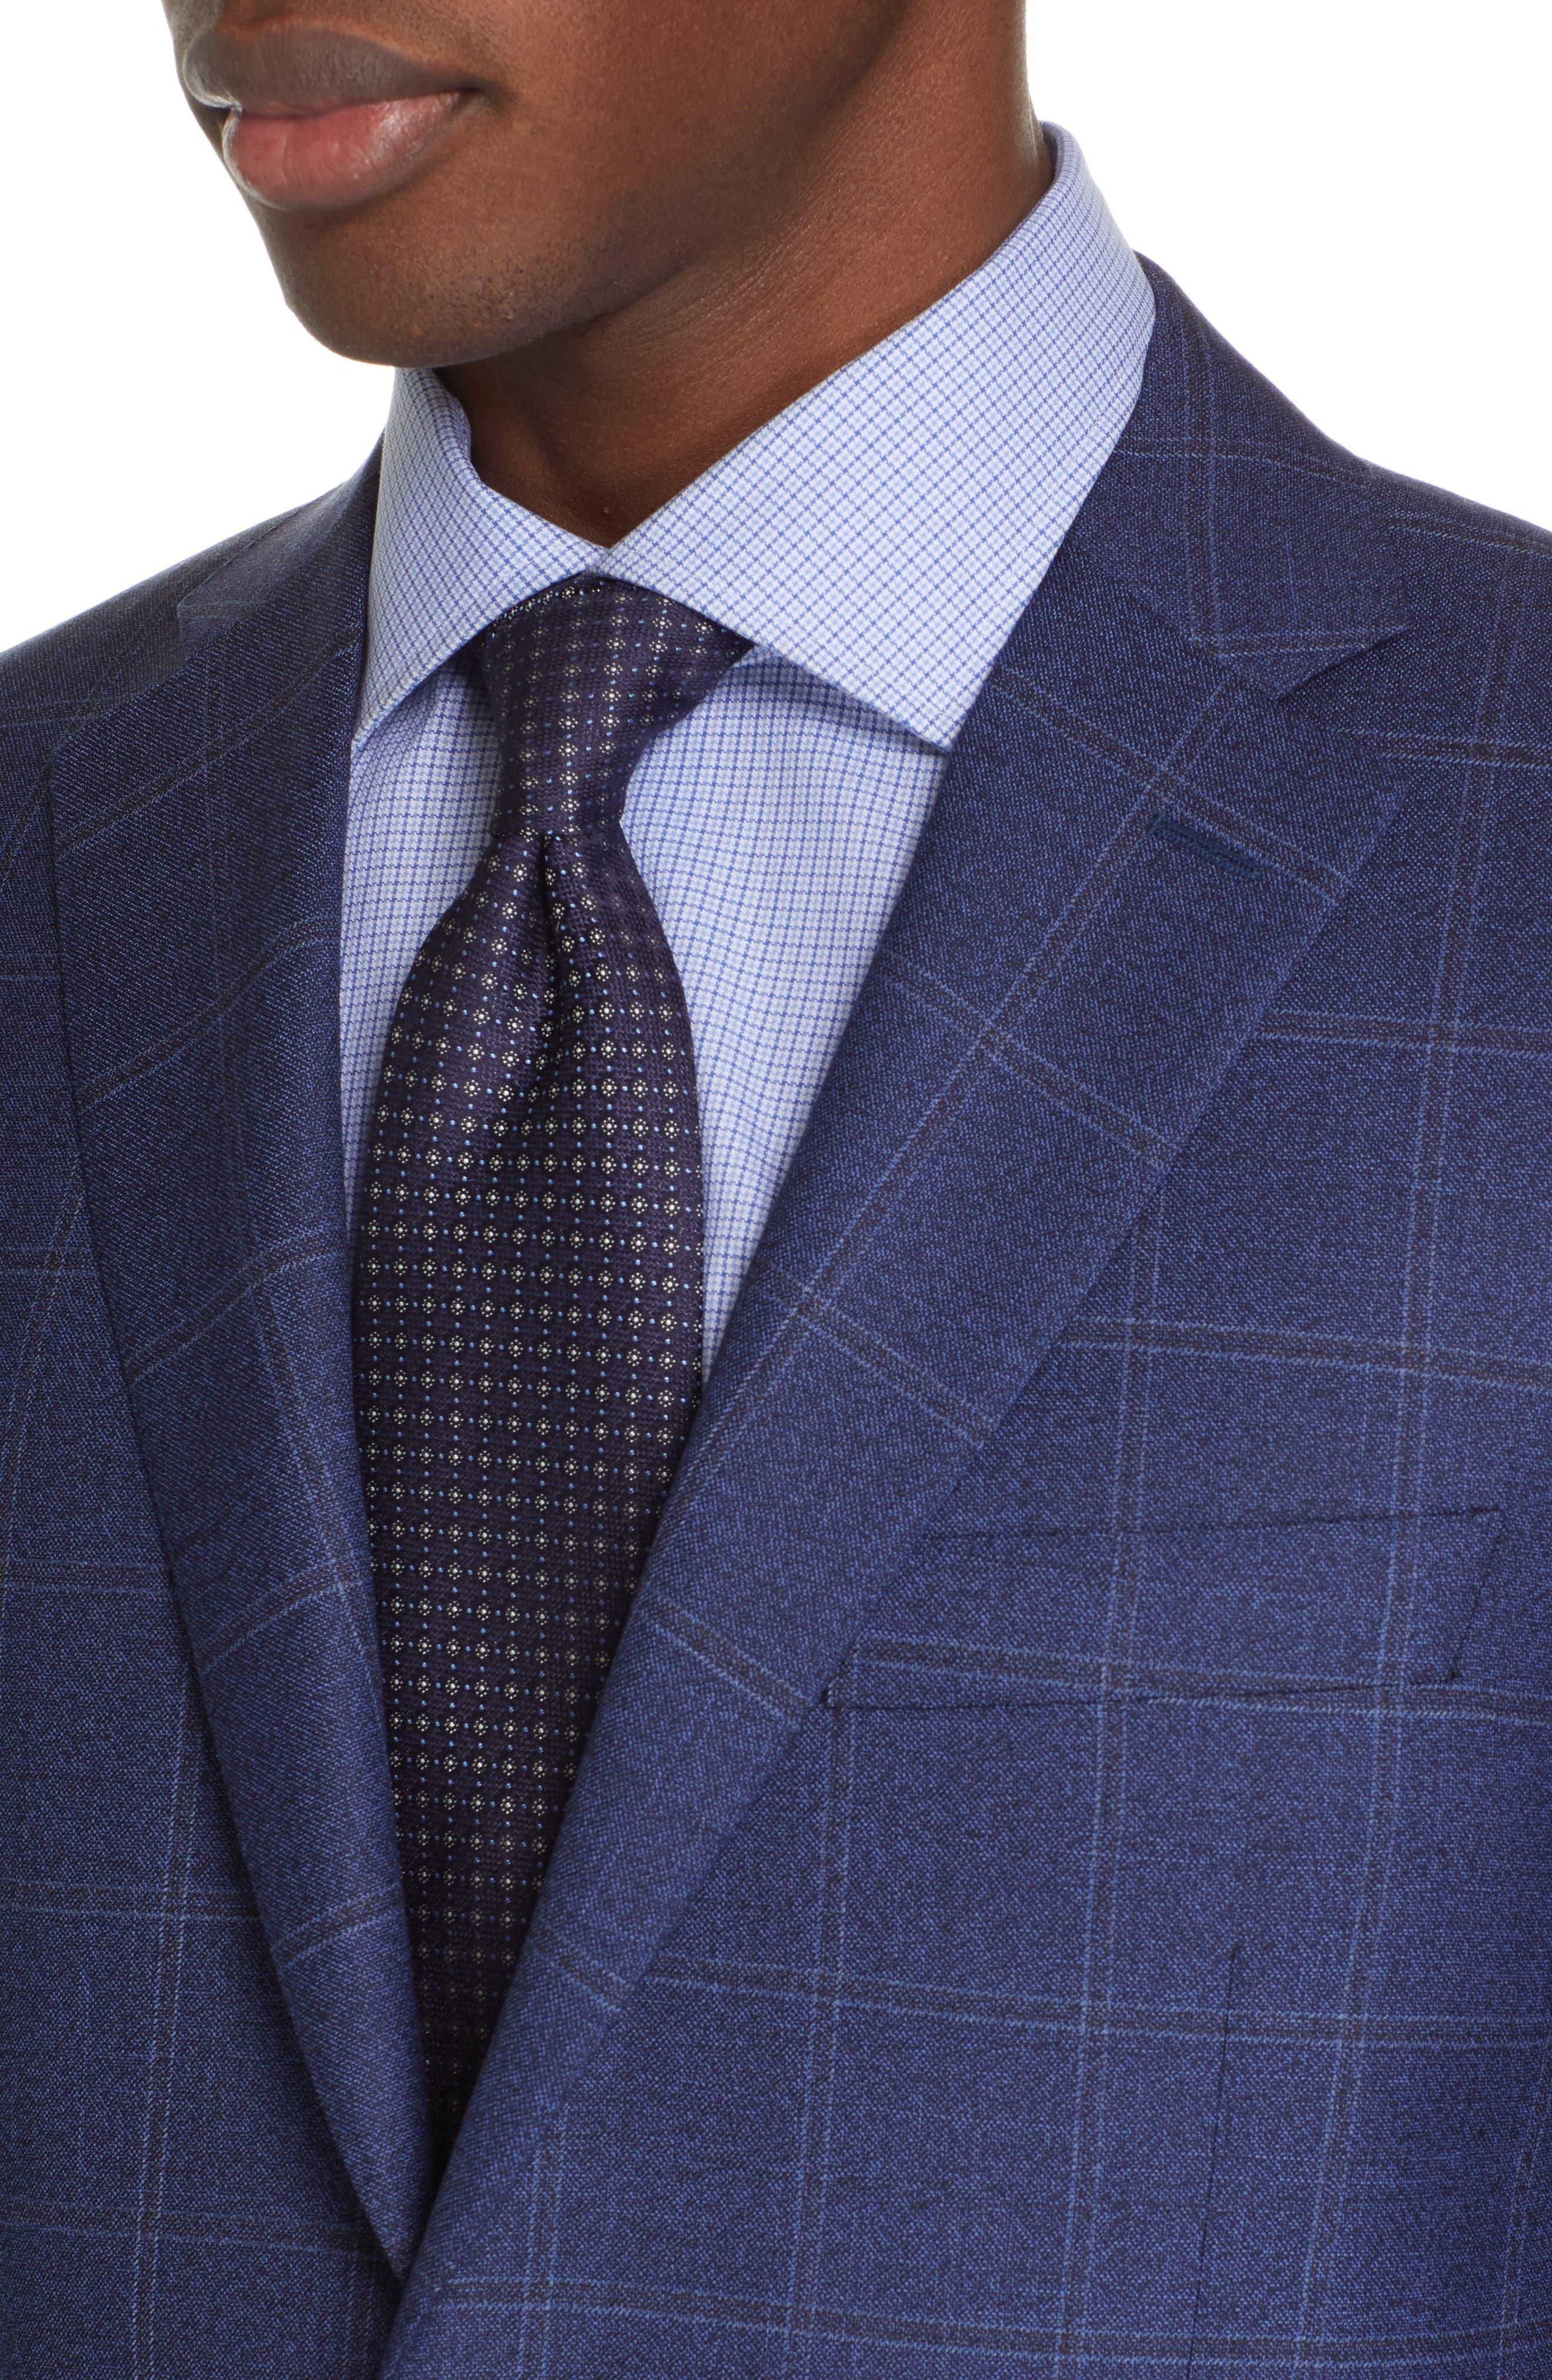 CANALI, Siena Classic Fit Plaid Wool Sport Coat, Alternate thumbnail 4, color, BLUE